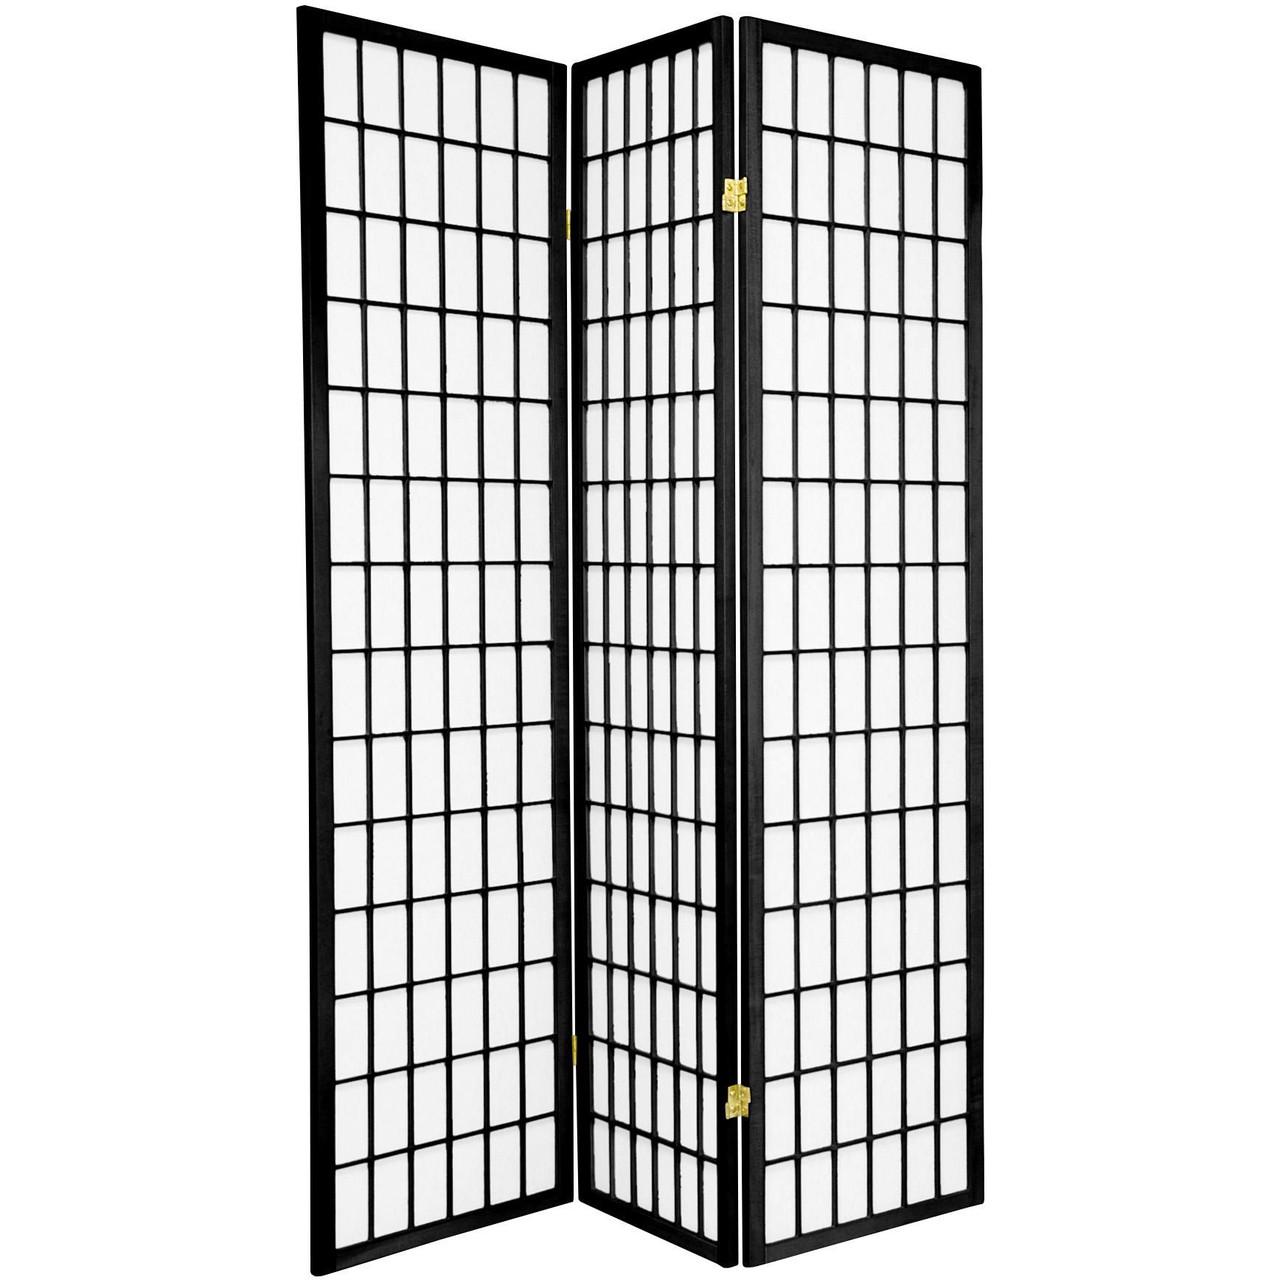 3 Panel Room Divider Shoji Design White, Natural, Black, Cherry, or Espresso Color